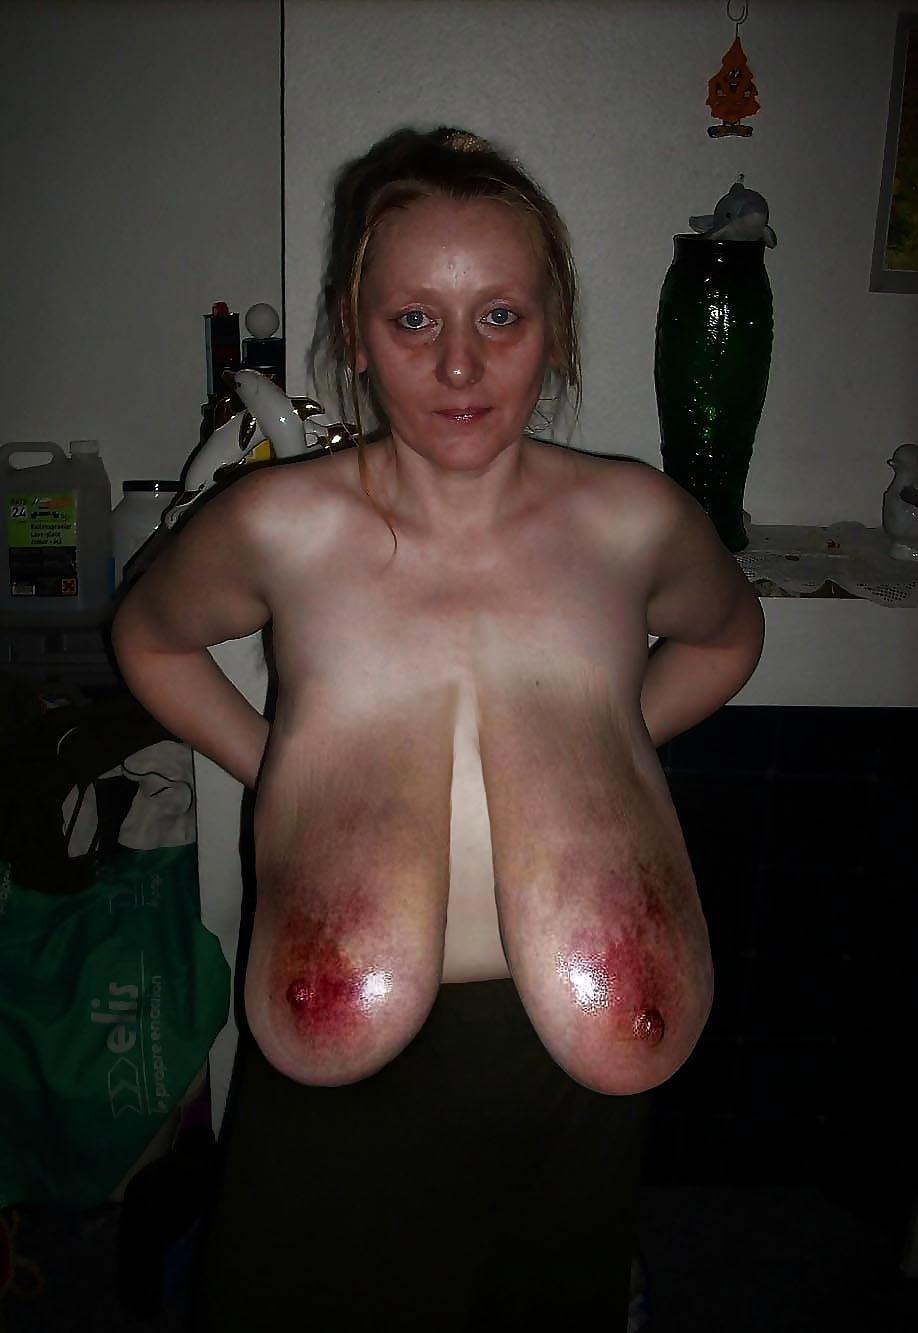 free-saggy-breasts-pics-star